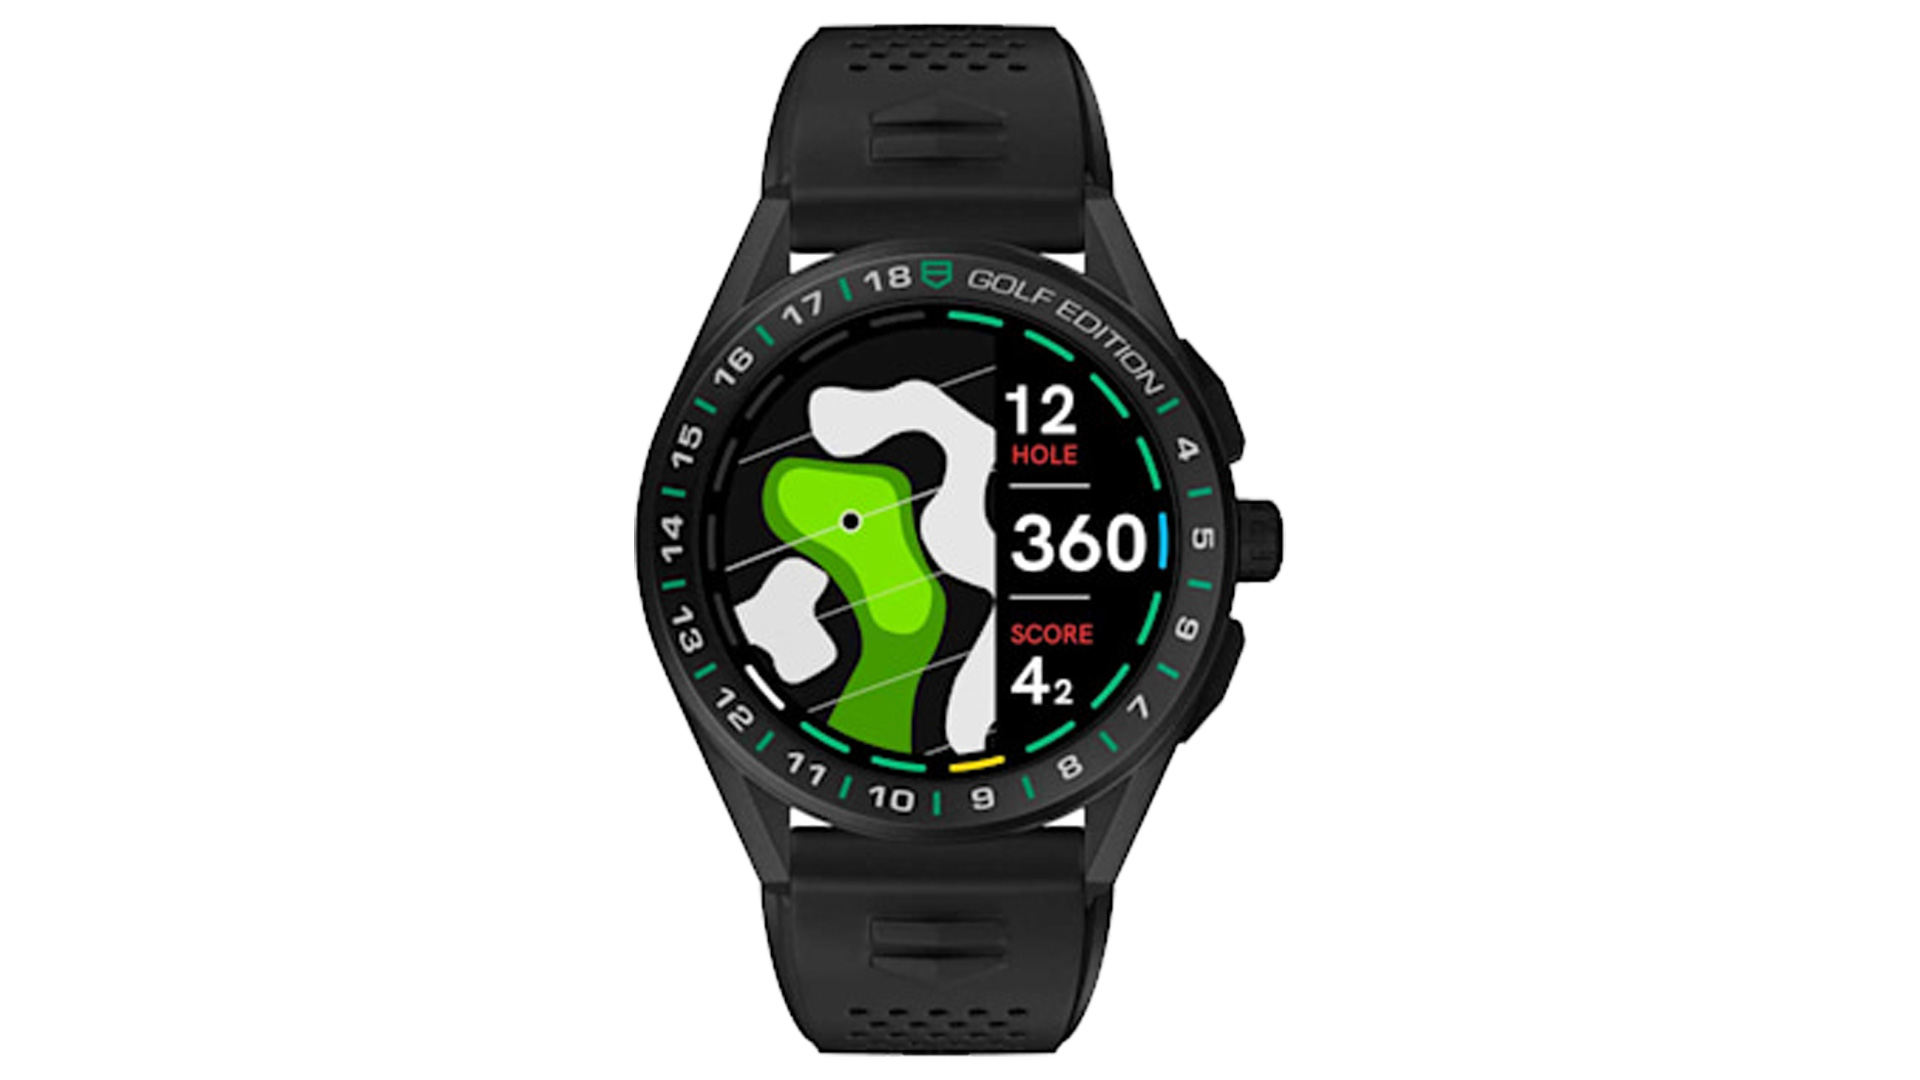 TAG Heuer Gold Edition è lo smartwatch che ogni golfista vor